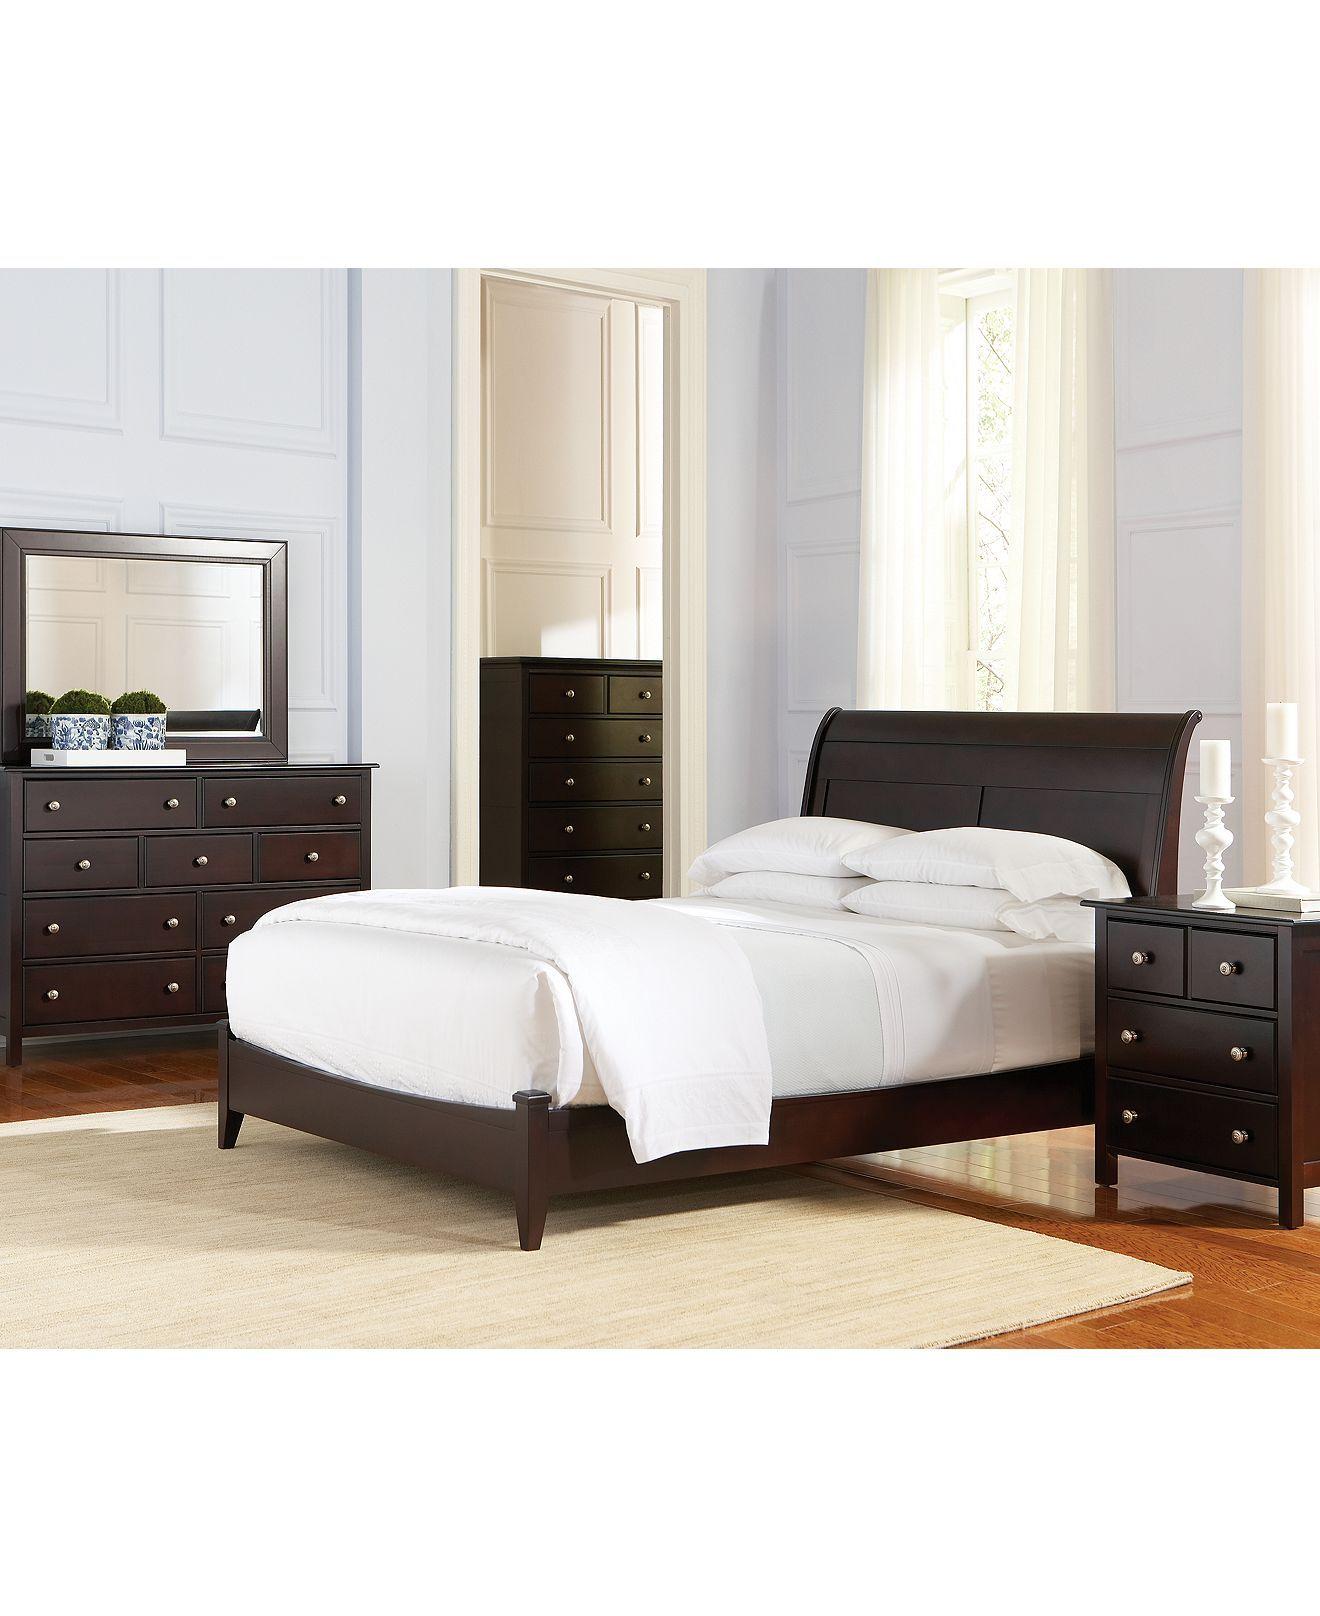 Murray Hill Ii Bedroom Furniture Collection Macys